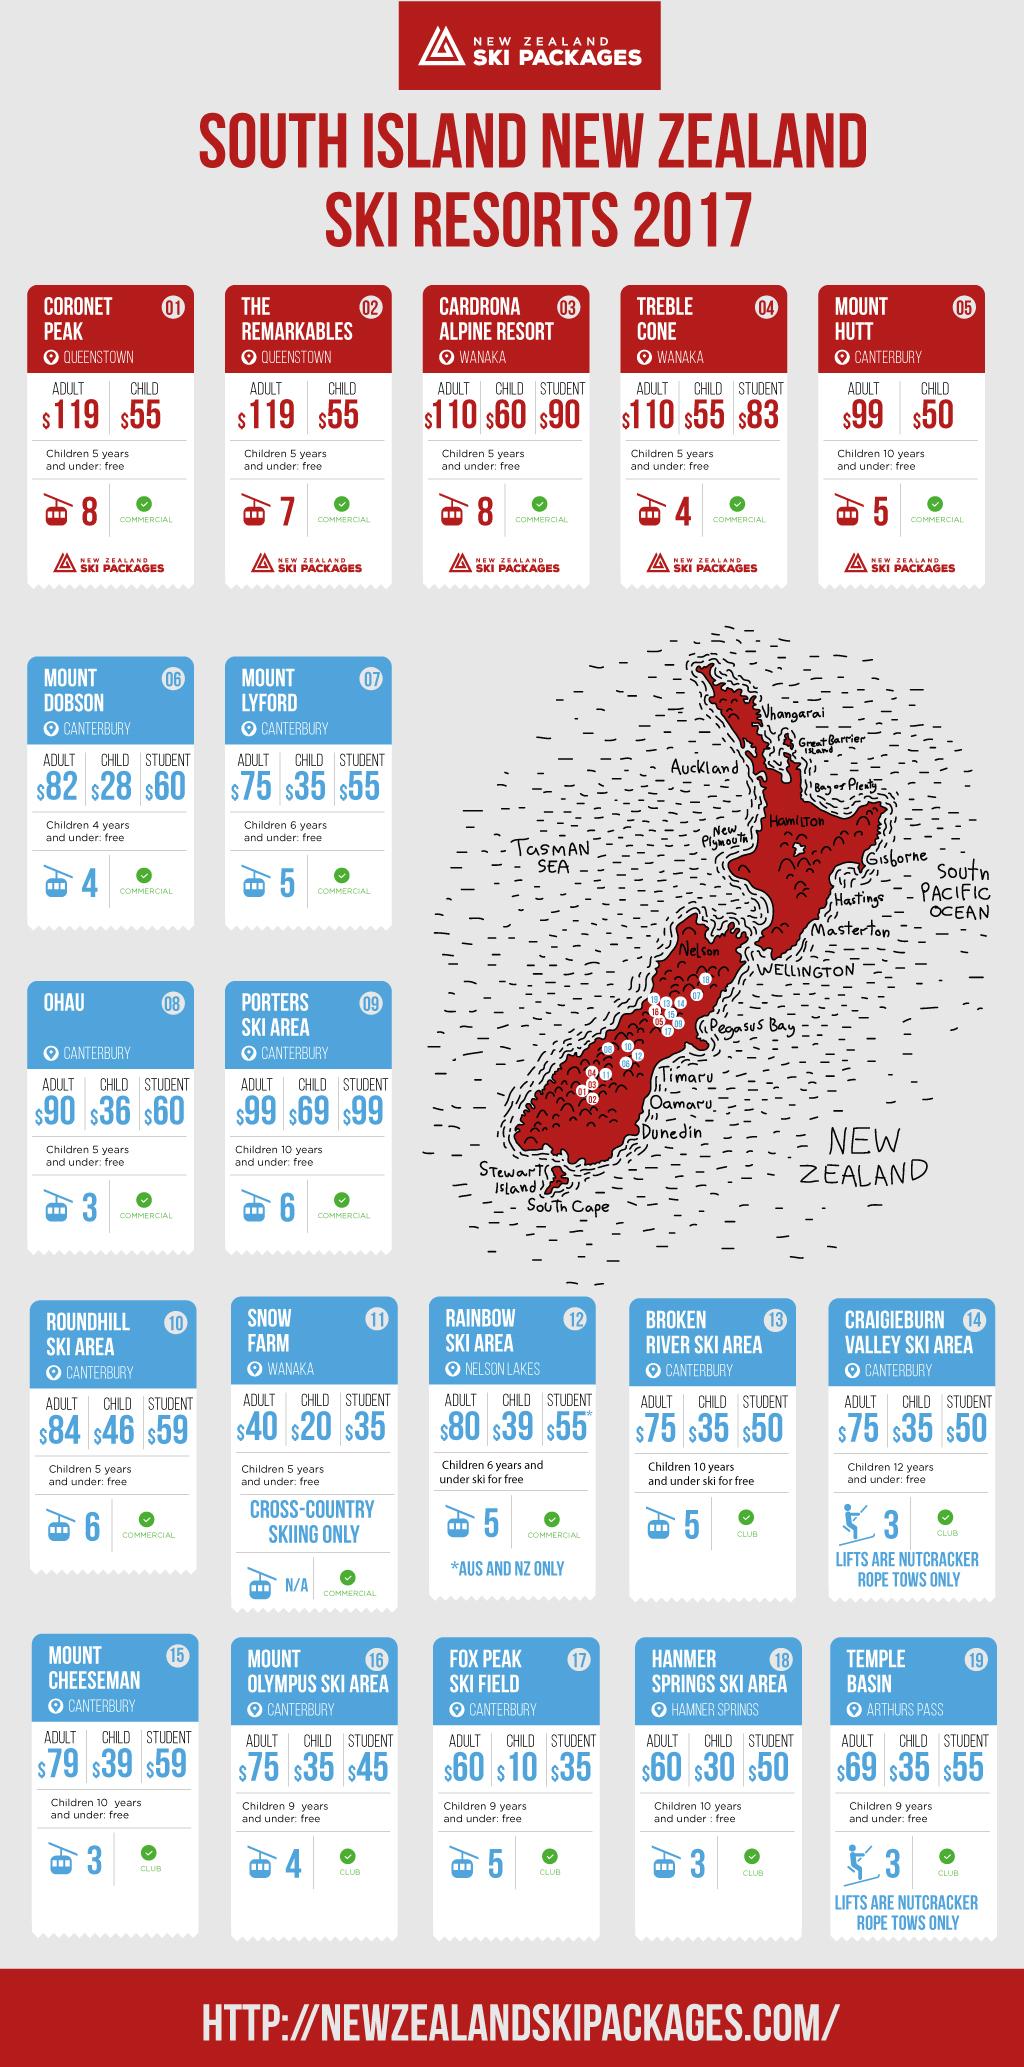 NZ south island ski resorts